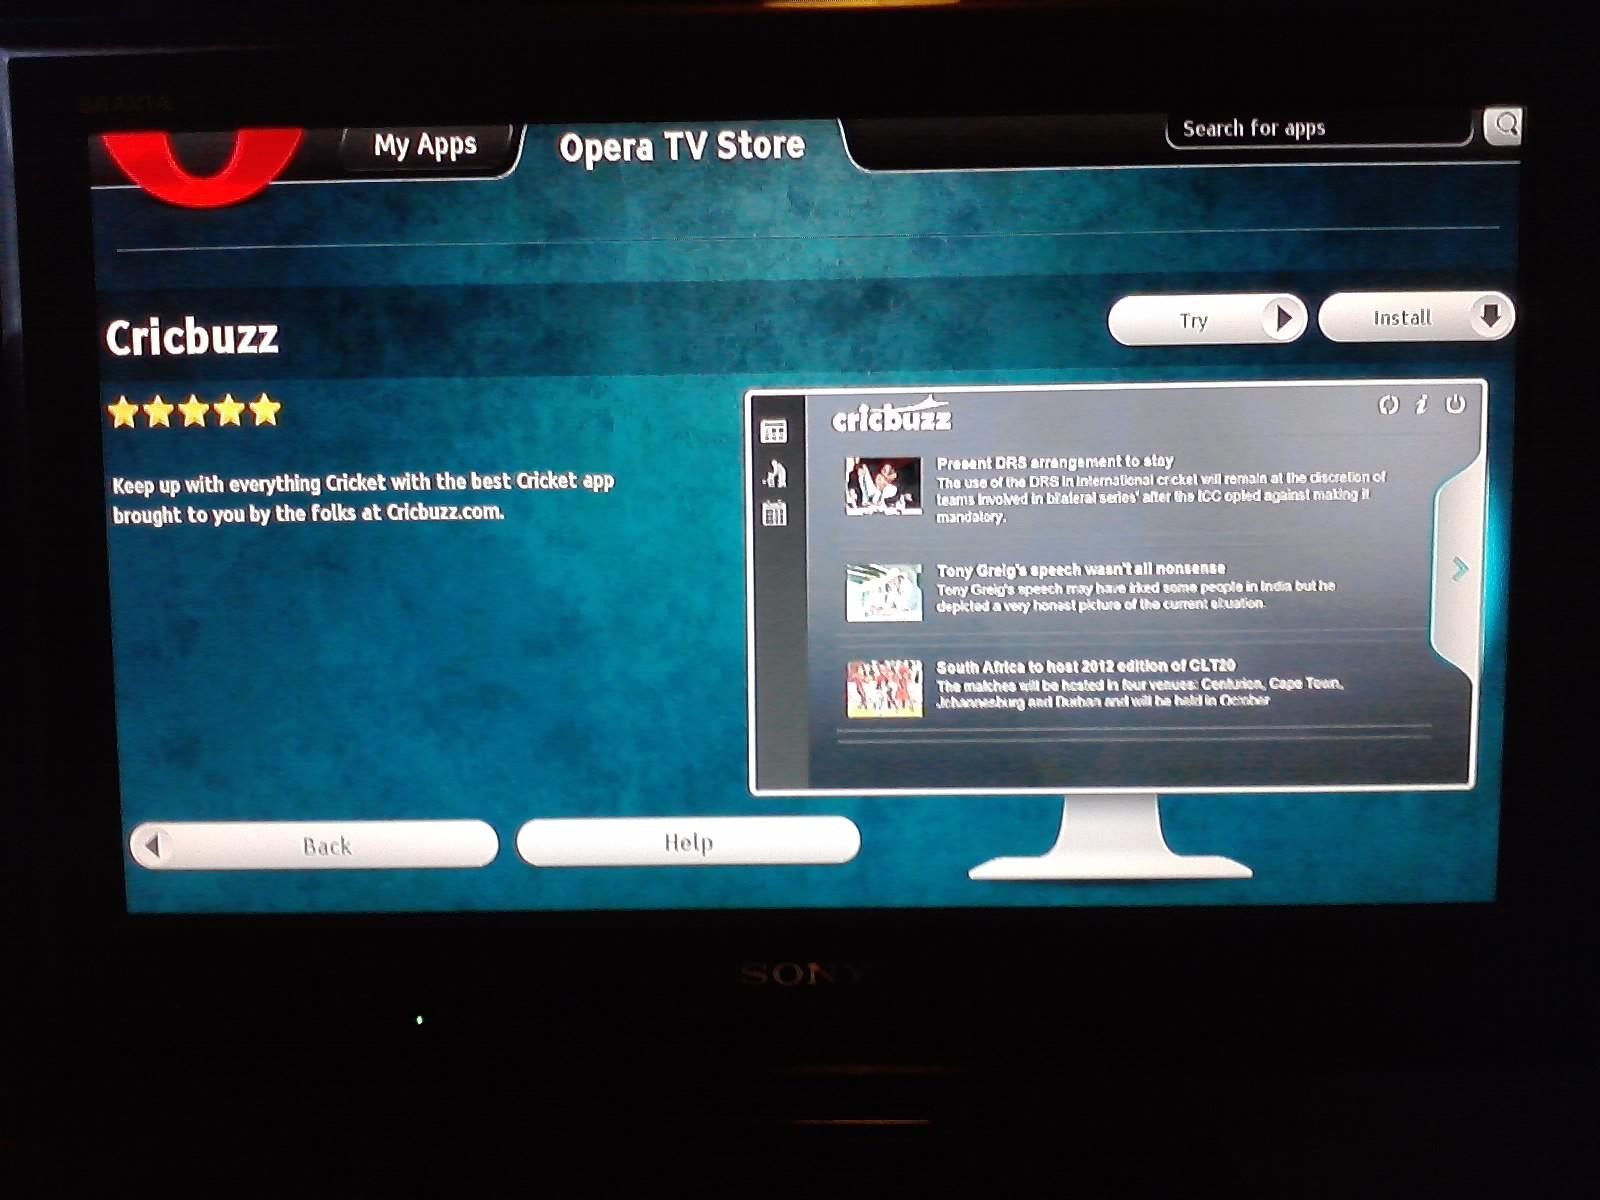 Opera Tv Store Sony Bravia